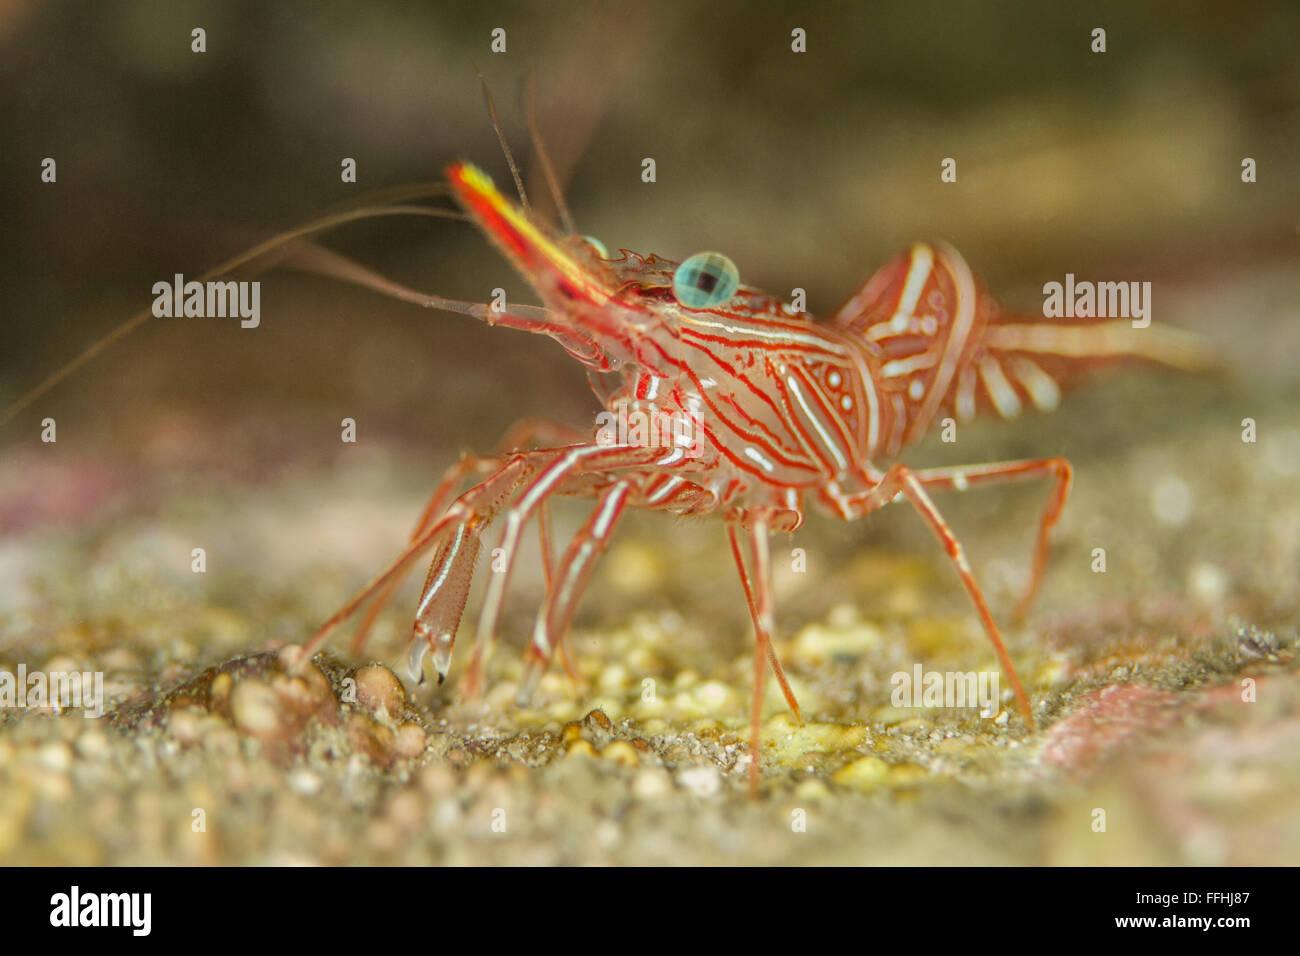 Durban Dancing Shrimp - Rhynchocinetes durbanensis - Stock Image